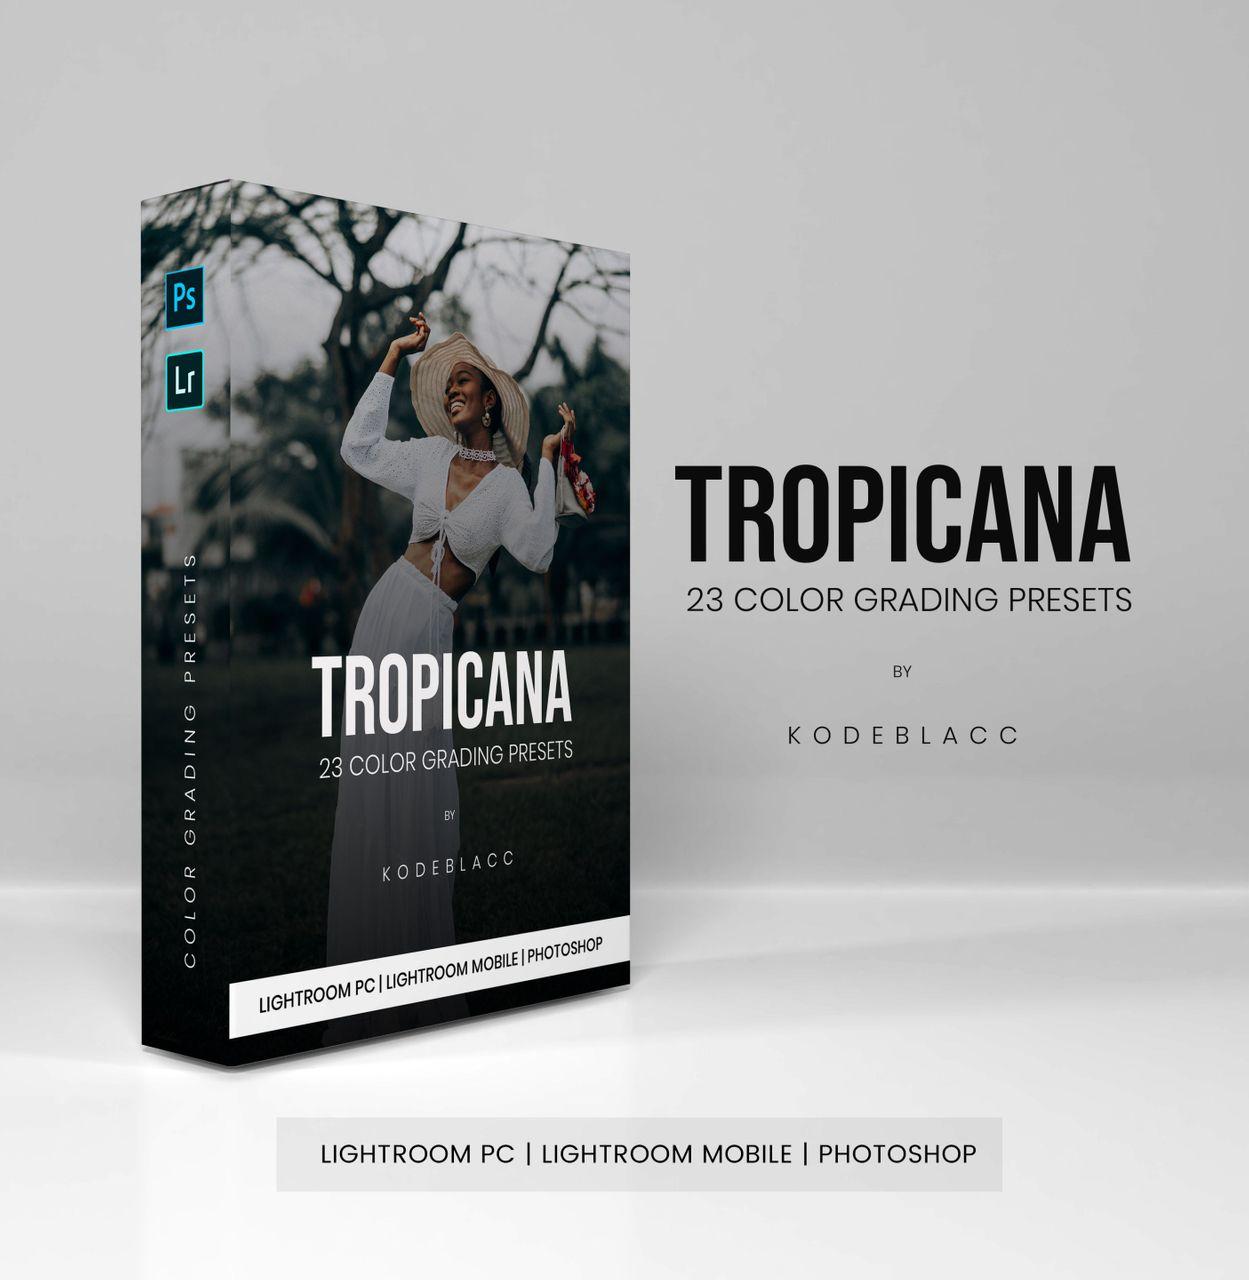 Tropicanatemplate.jpg